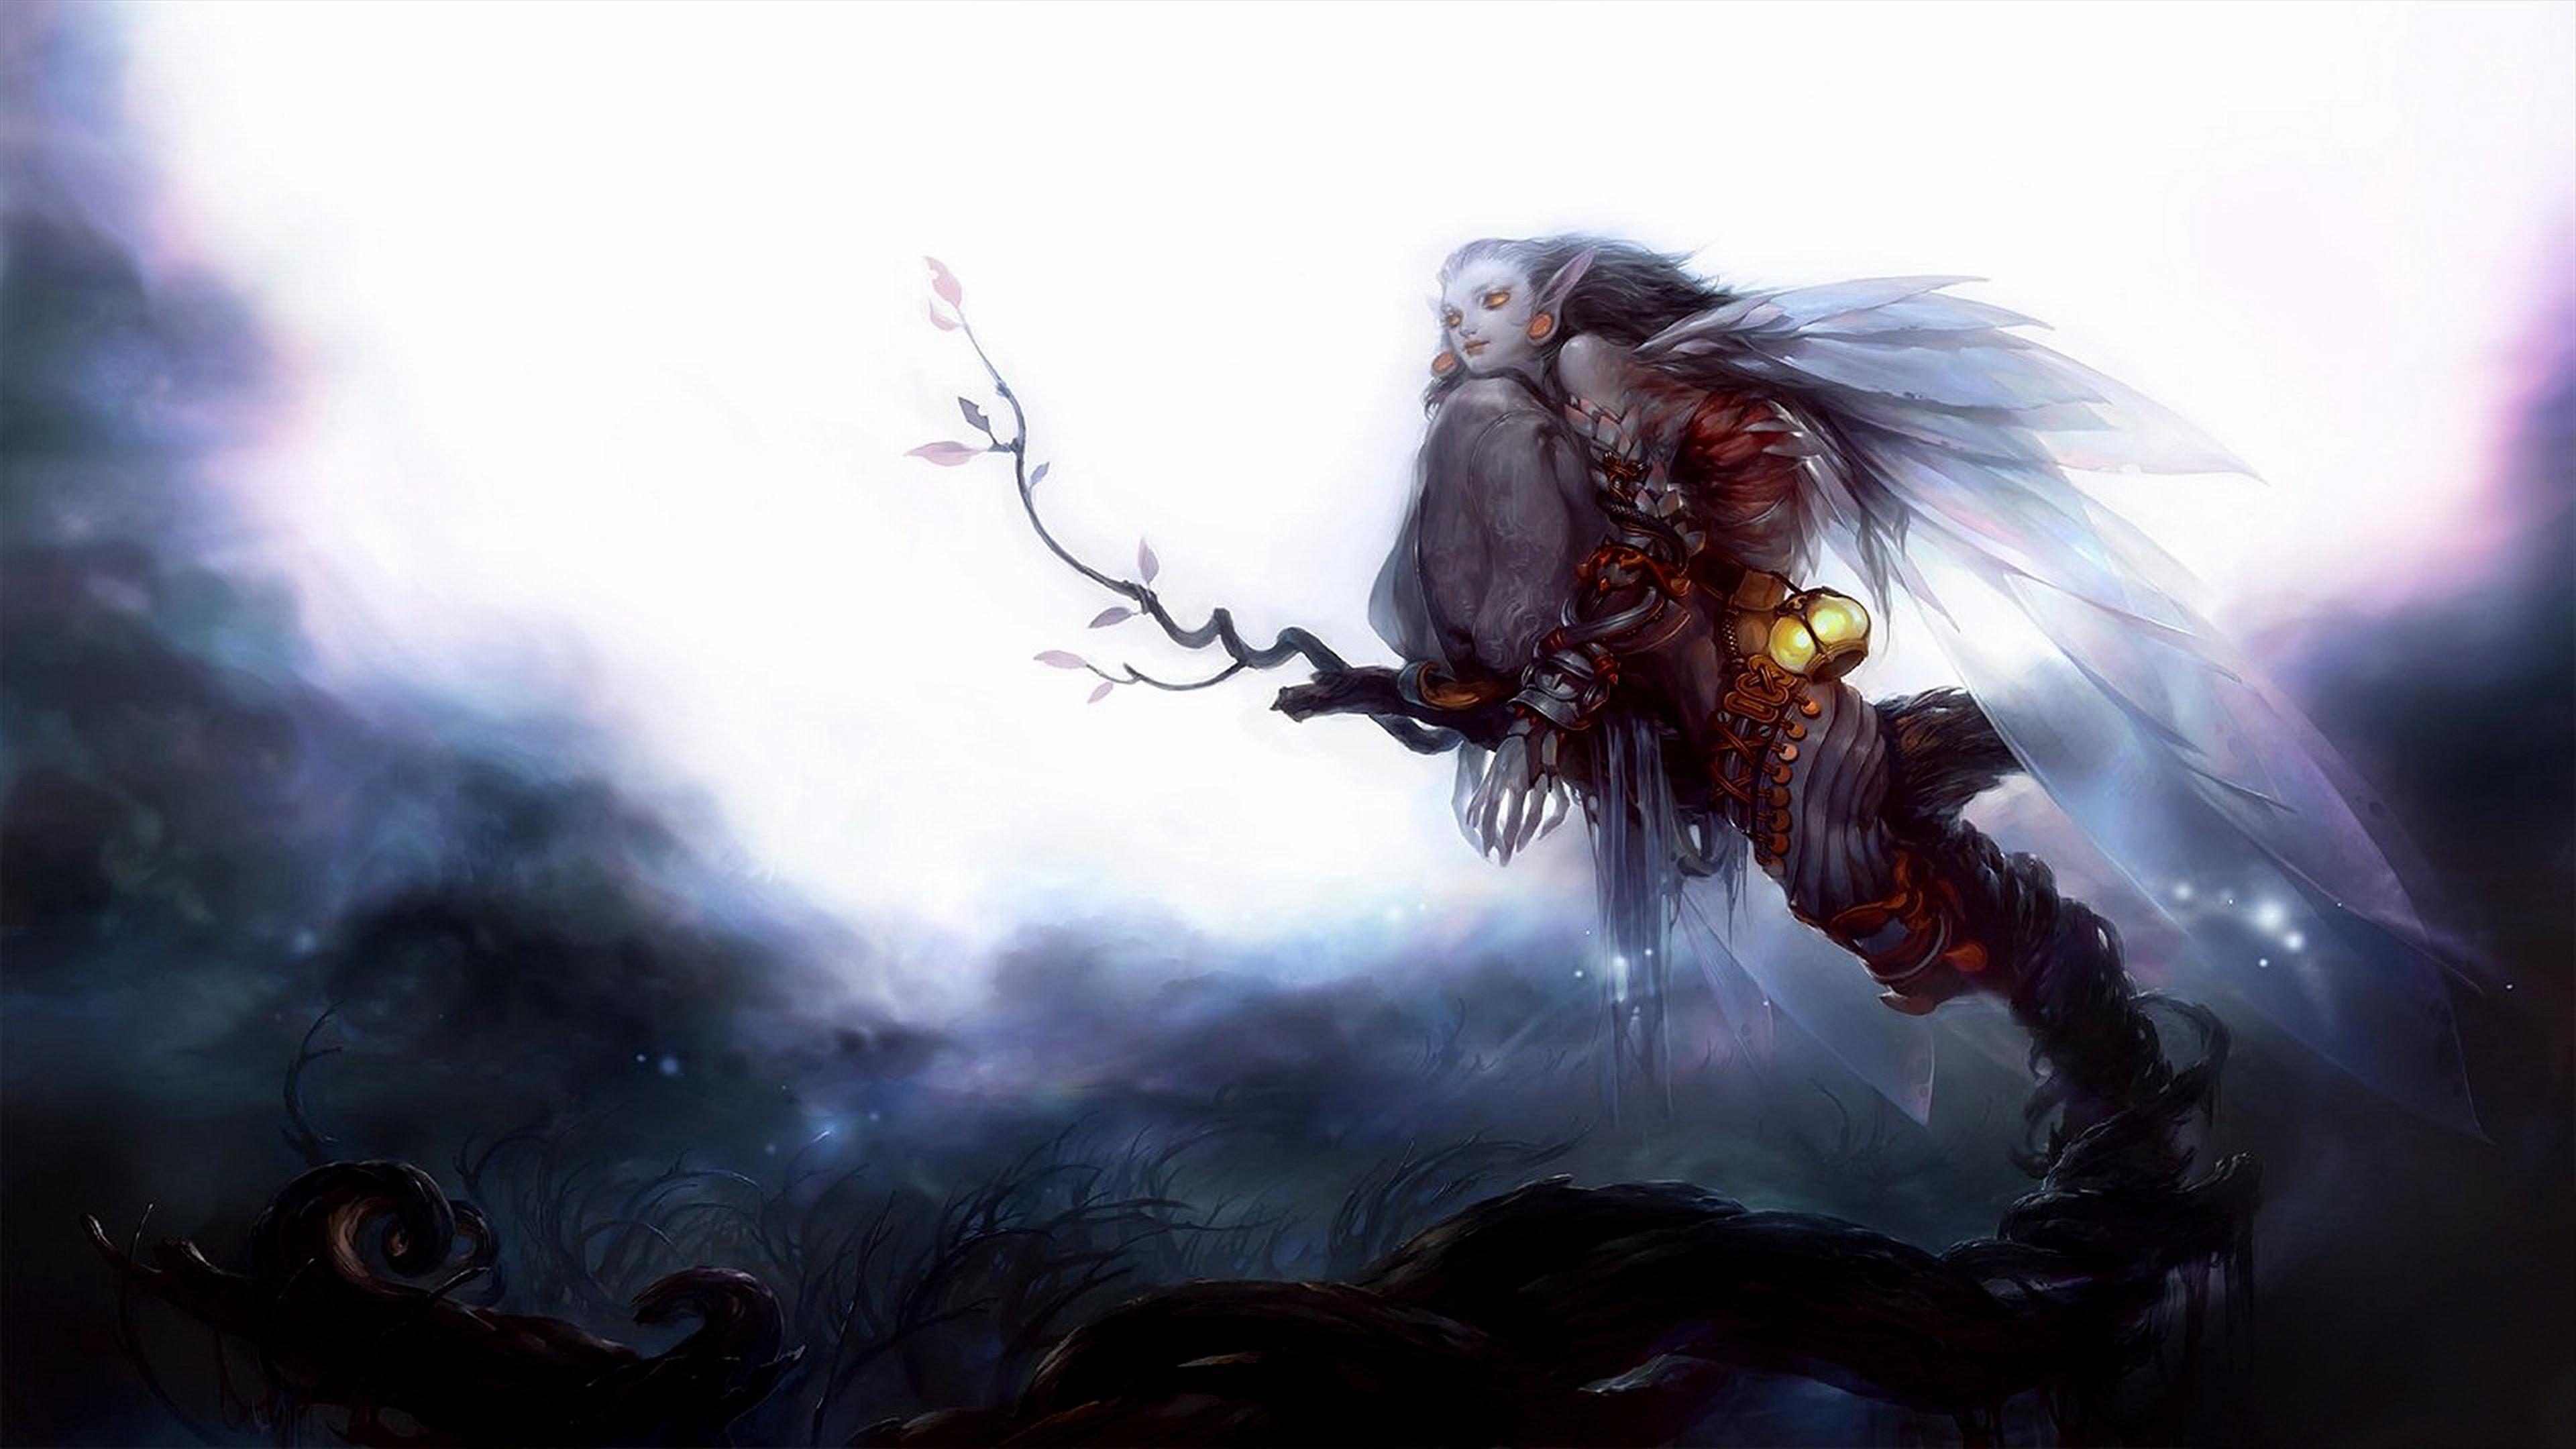 Fairy Wallpaper For Desktop | PixelsTalk.Net